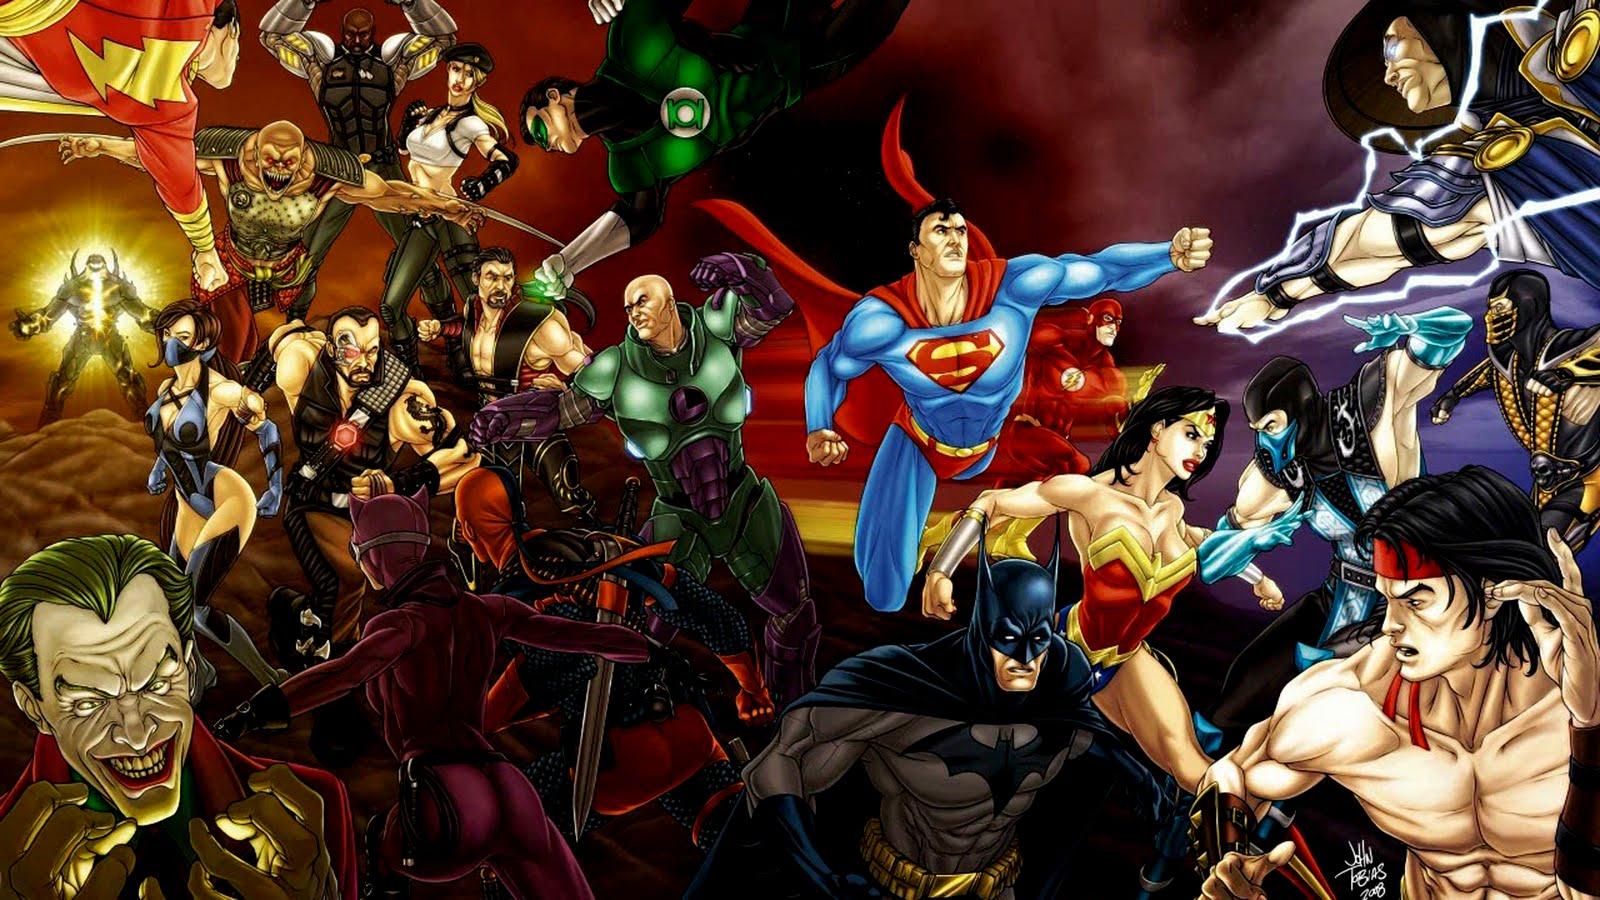 DC Comics All Super Heroes HD Wallpapers Desktop Wallpapers 1600x900